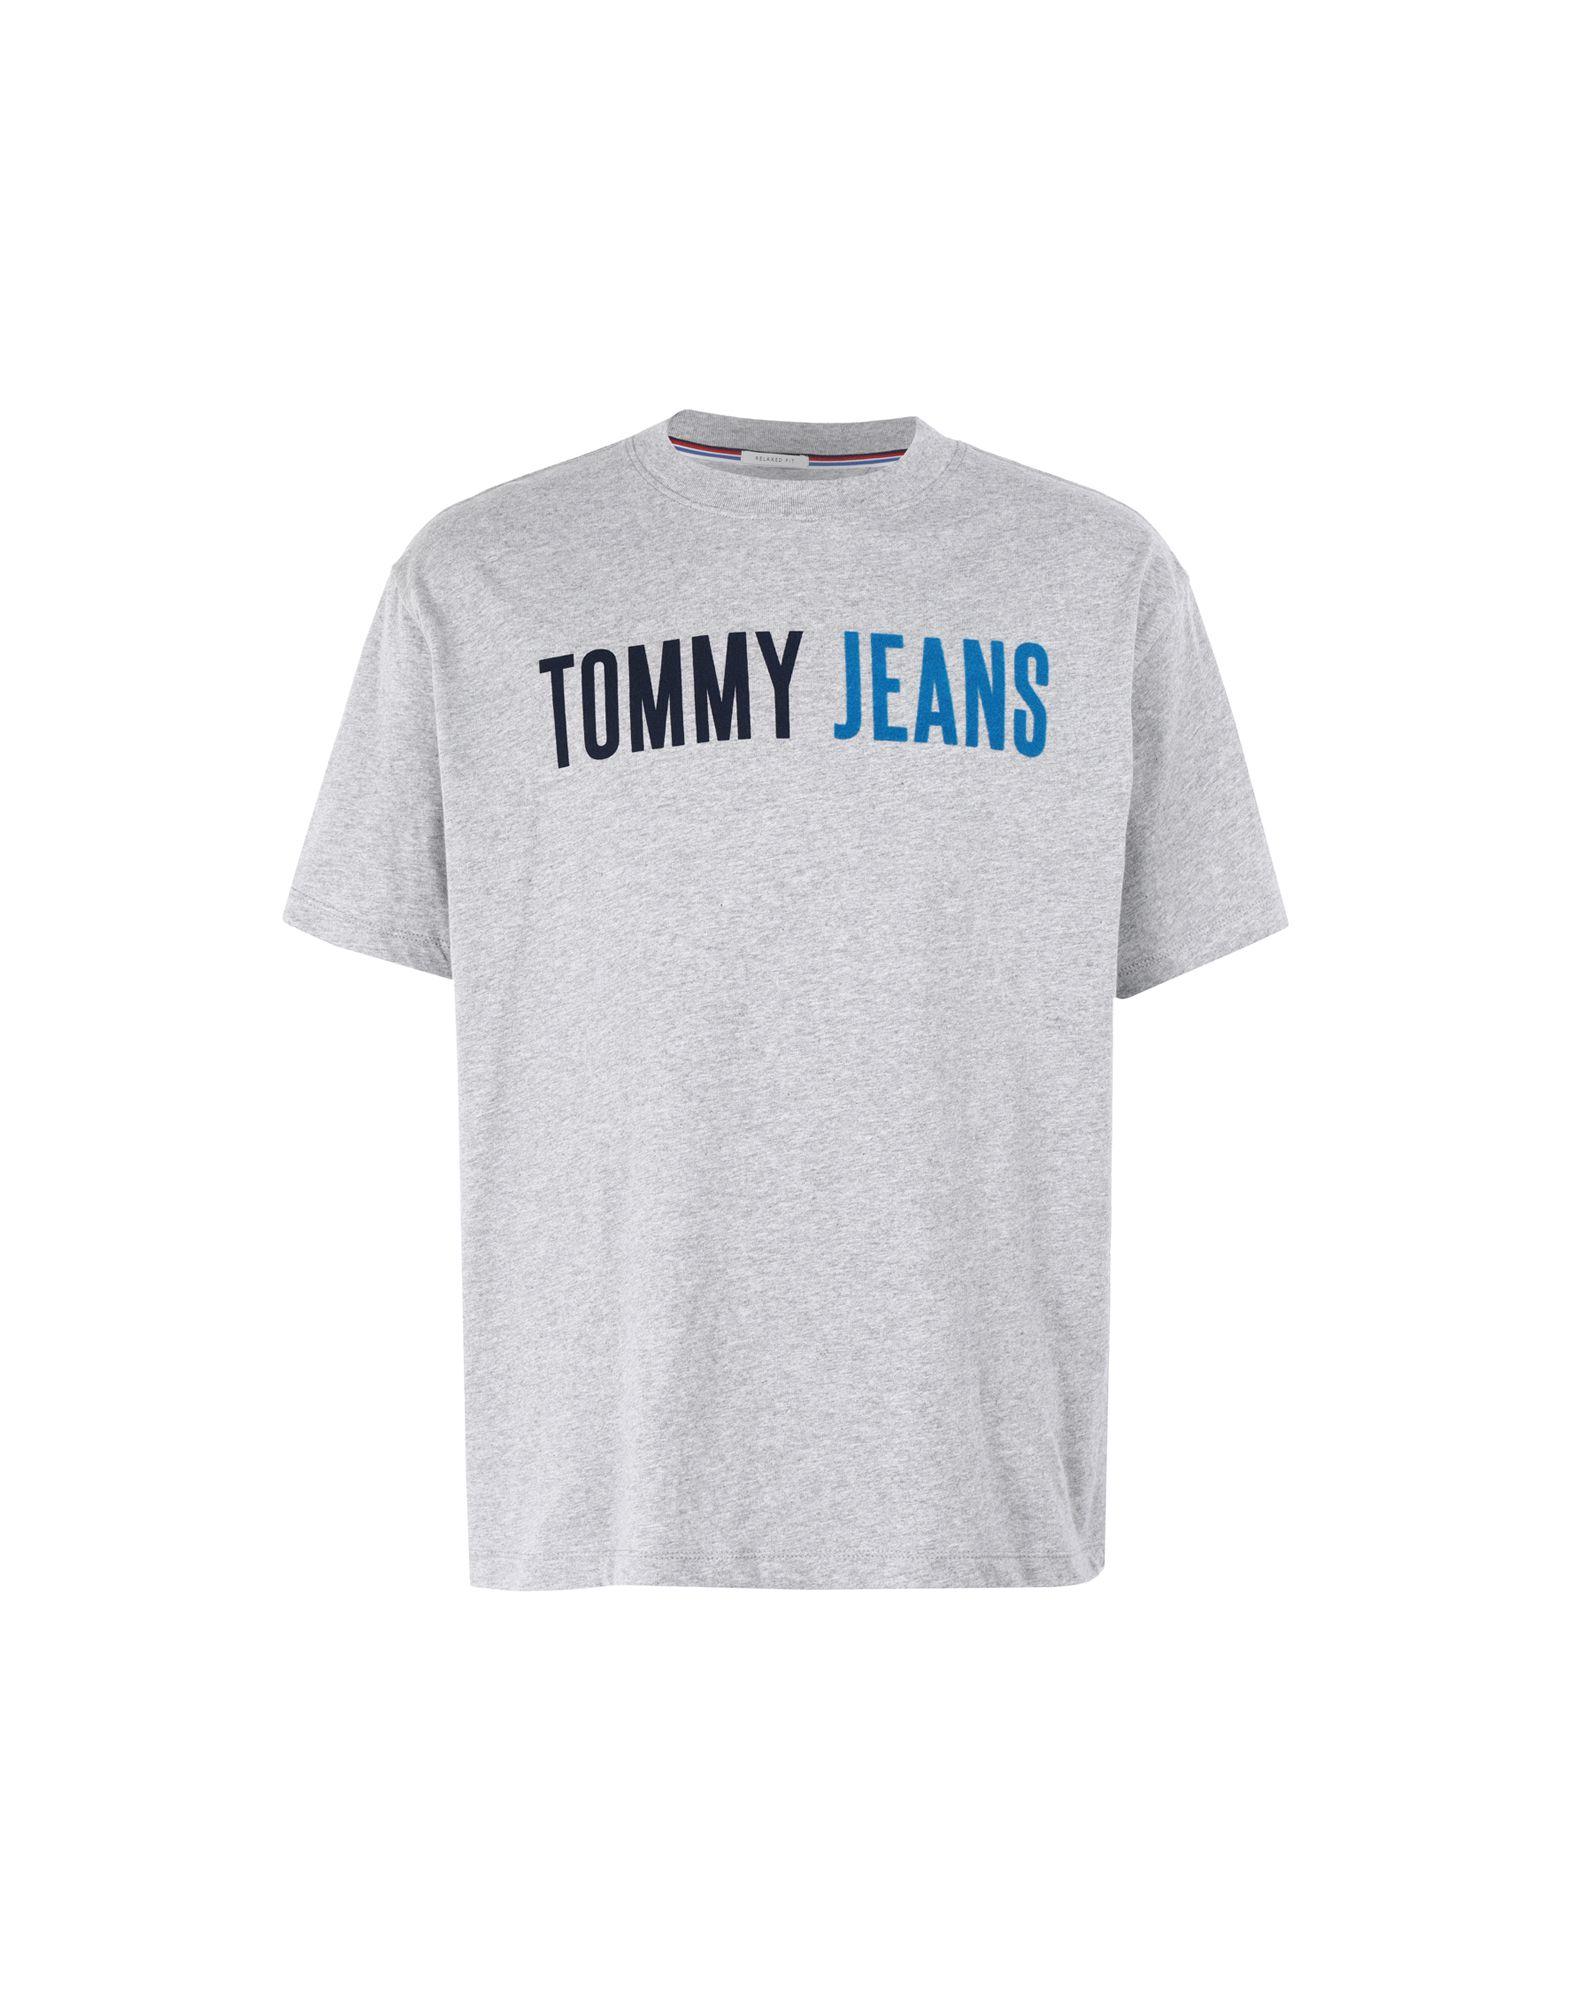 TOMMY JEANS Футболка футболка tommy jeans tommy jeans to052embhrt1